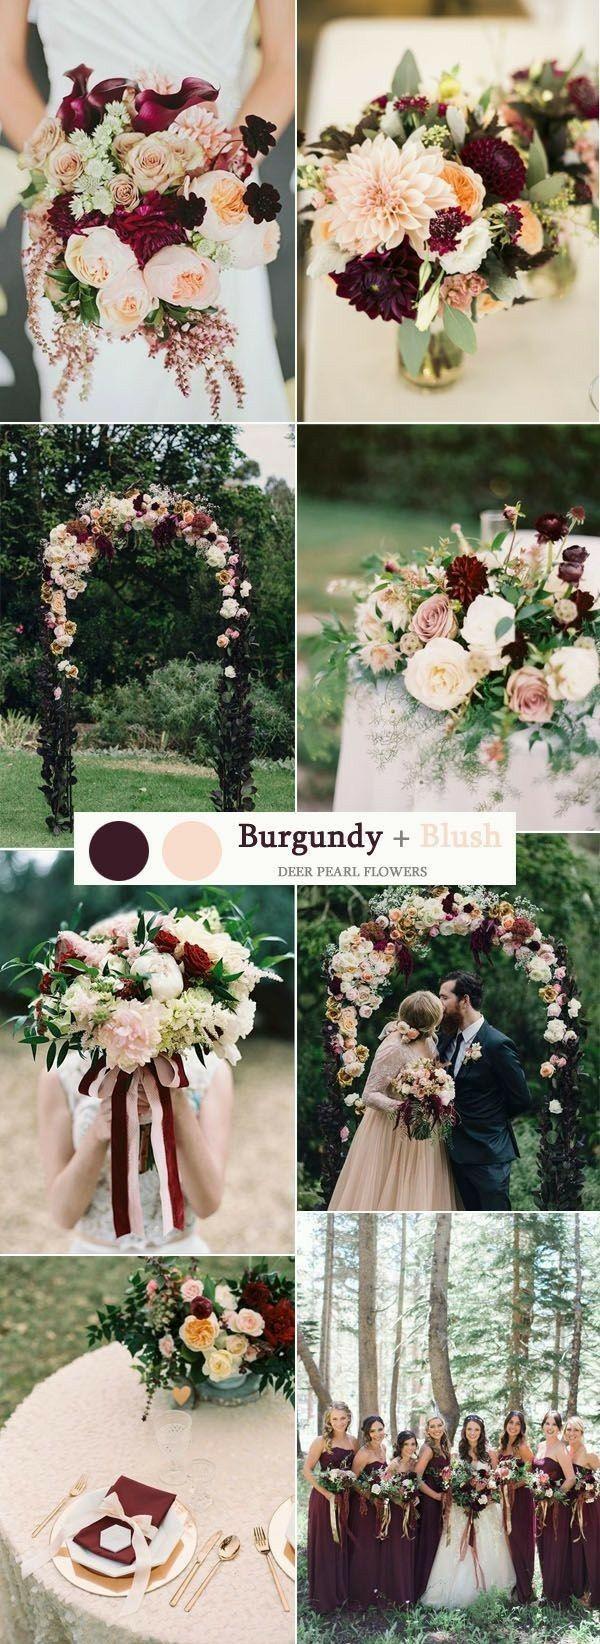 best Wedding flowers images on Pinterest  Wedding ideas